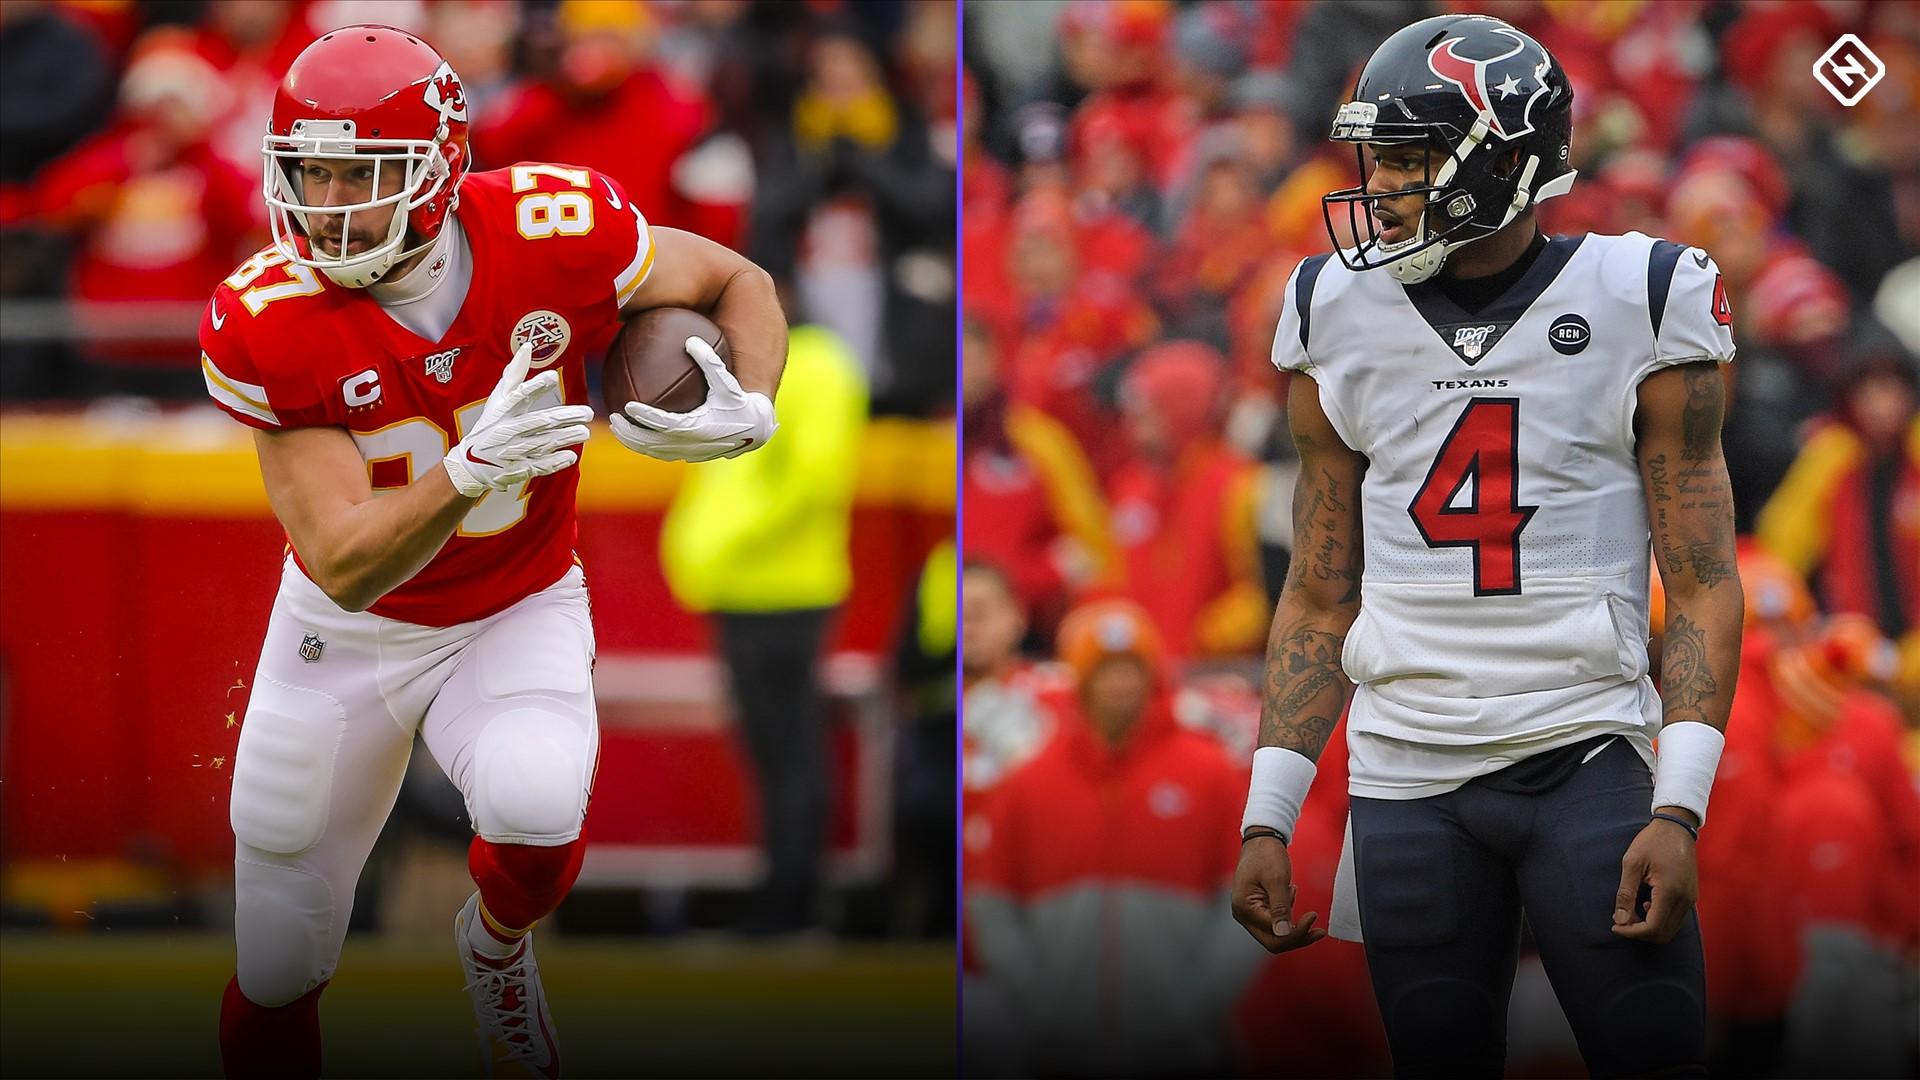 Texans vs. Chiefs: Fantasy Football Start 'Em Sit 'Em for Week 1 Thursday Night Football